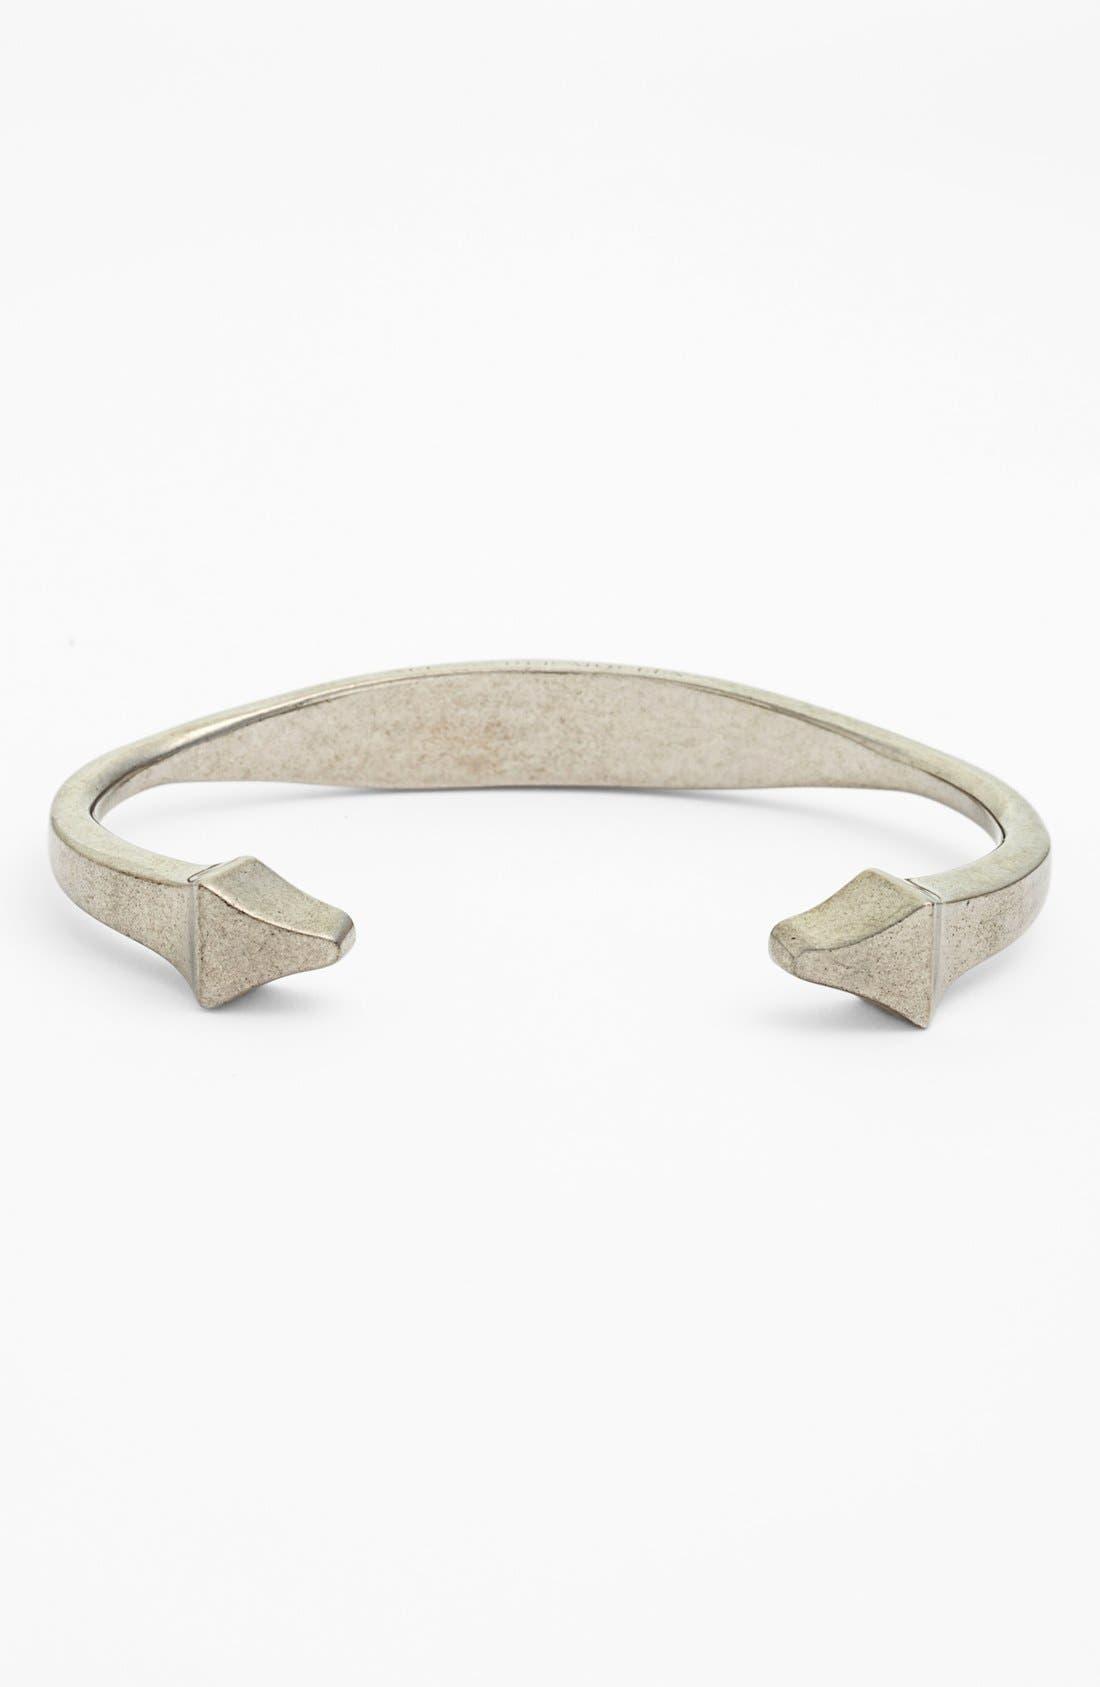 Main Image - Alexander McQueen Anatomical Brass Bracelet